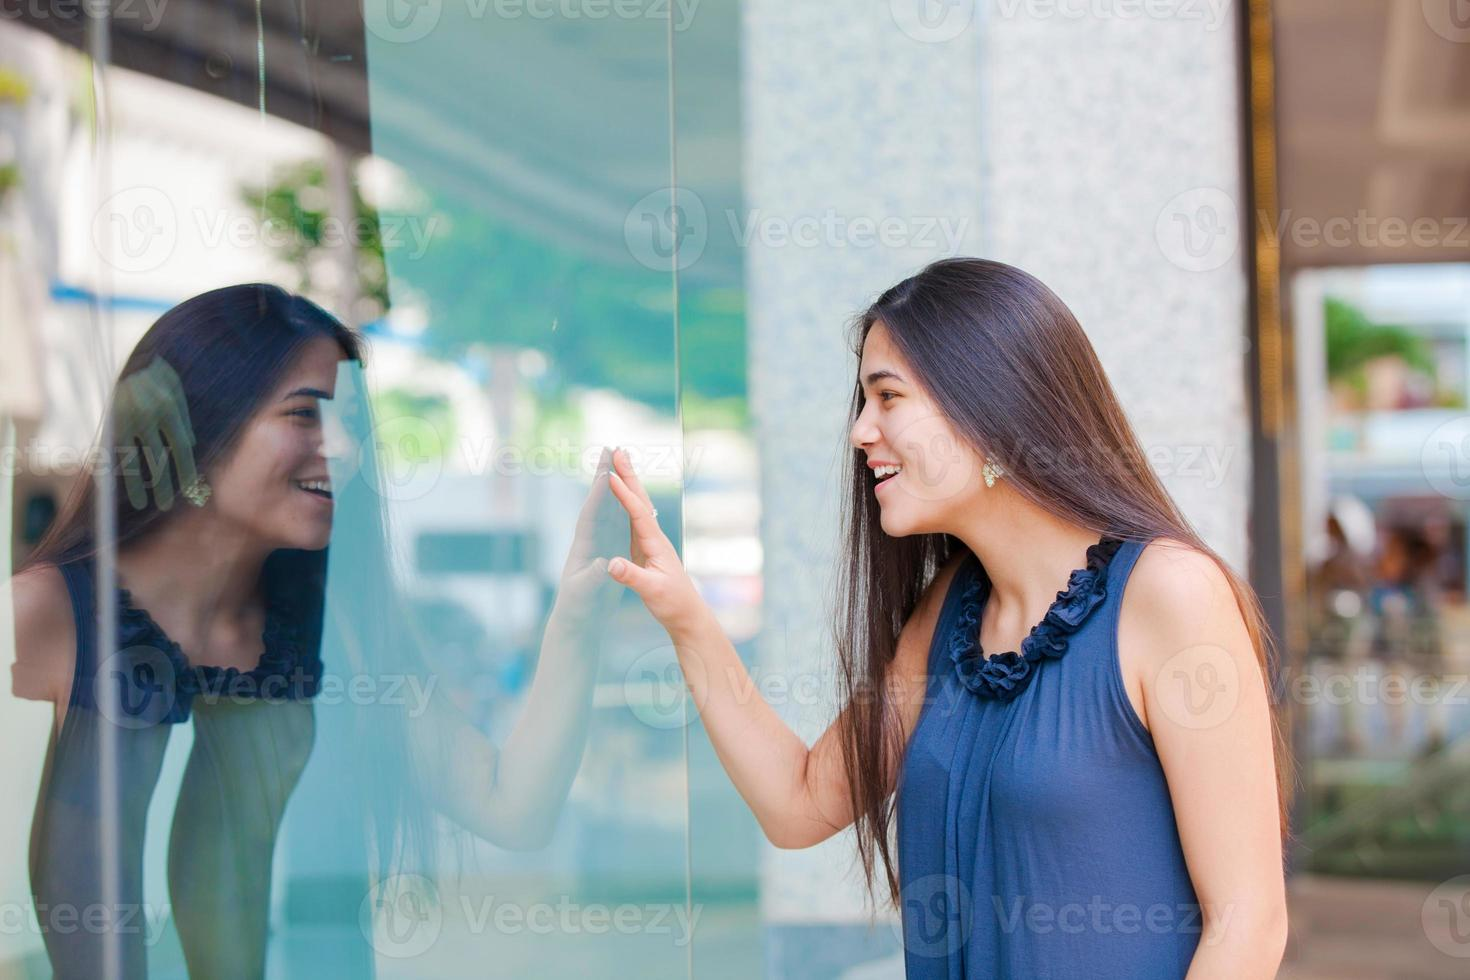 biracial Teen Mädchen Schaufensterbummel in der städtischen Umgebung Innenstadt foto